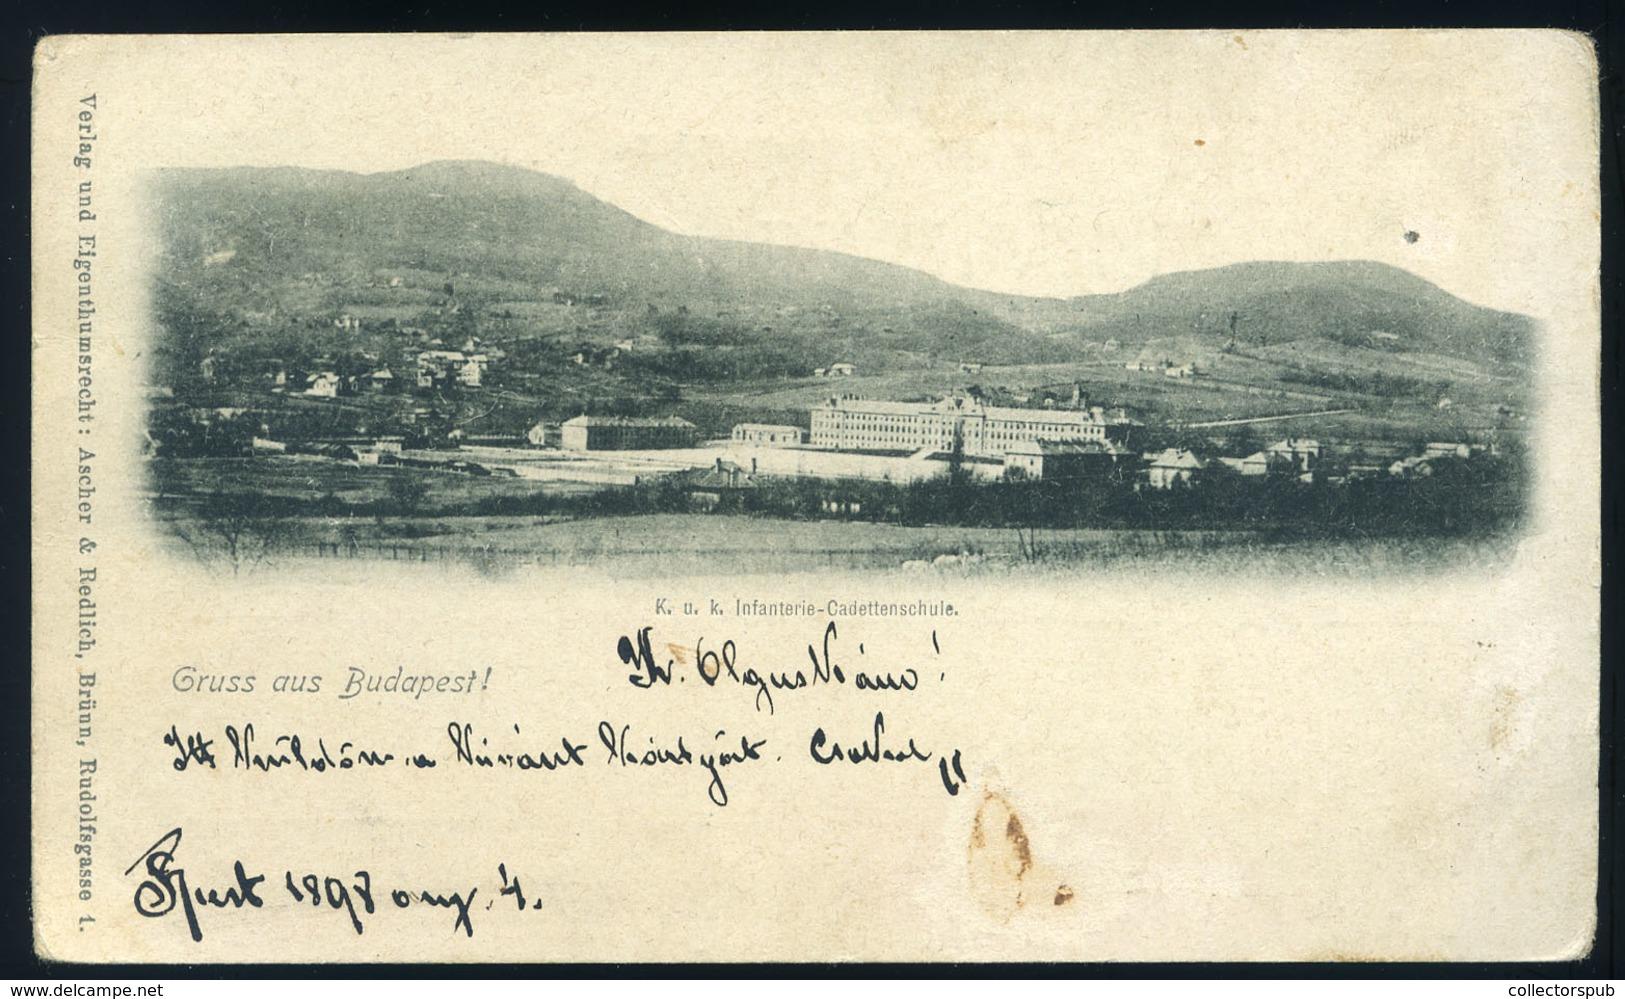 89824 BUDAPEST 1898. K.u.K. Kadet Iskola , Régi Képeslap  /  1898 K.u.K. Cadet School Vintage Picture Postcard - Hungary